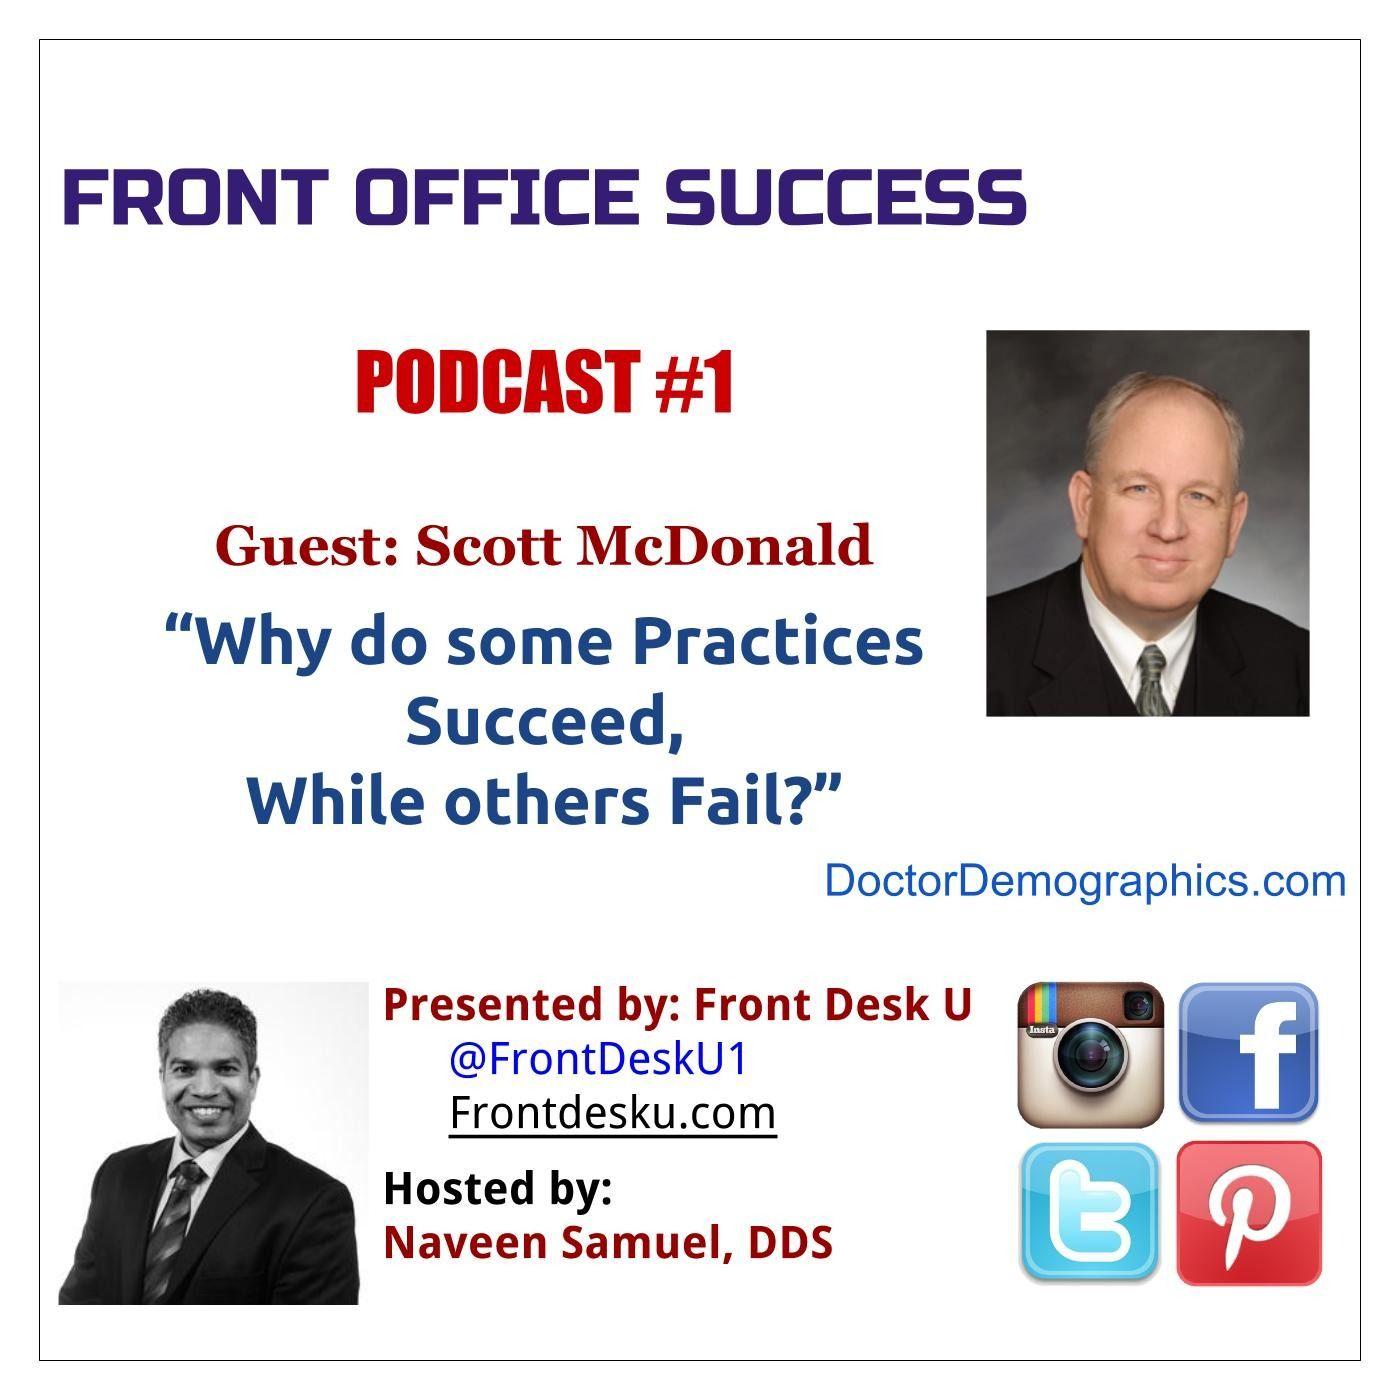 Front Office Success - Podcast #1 - Scott McDonald